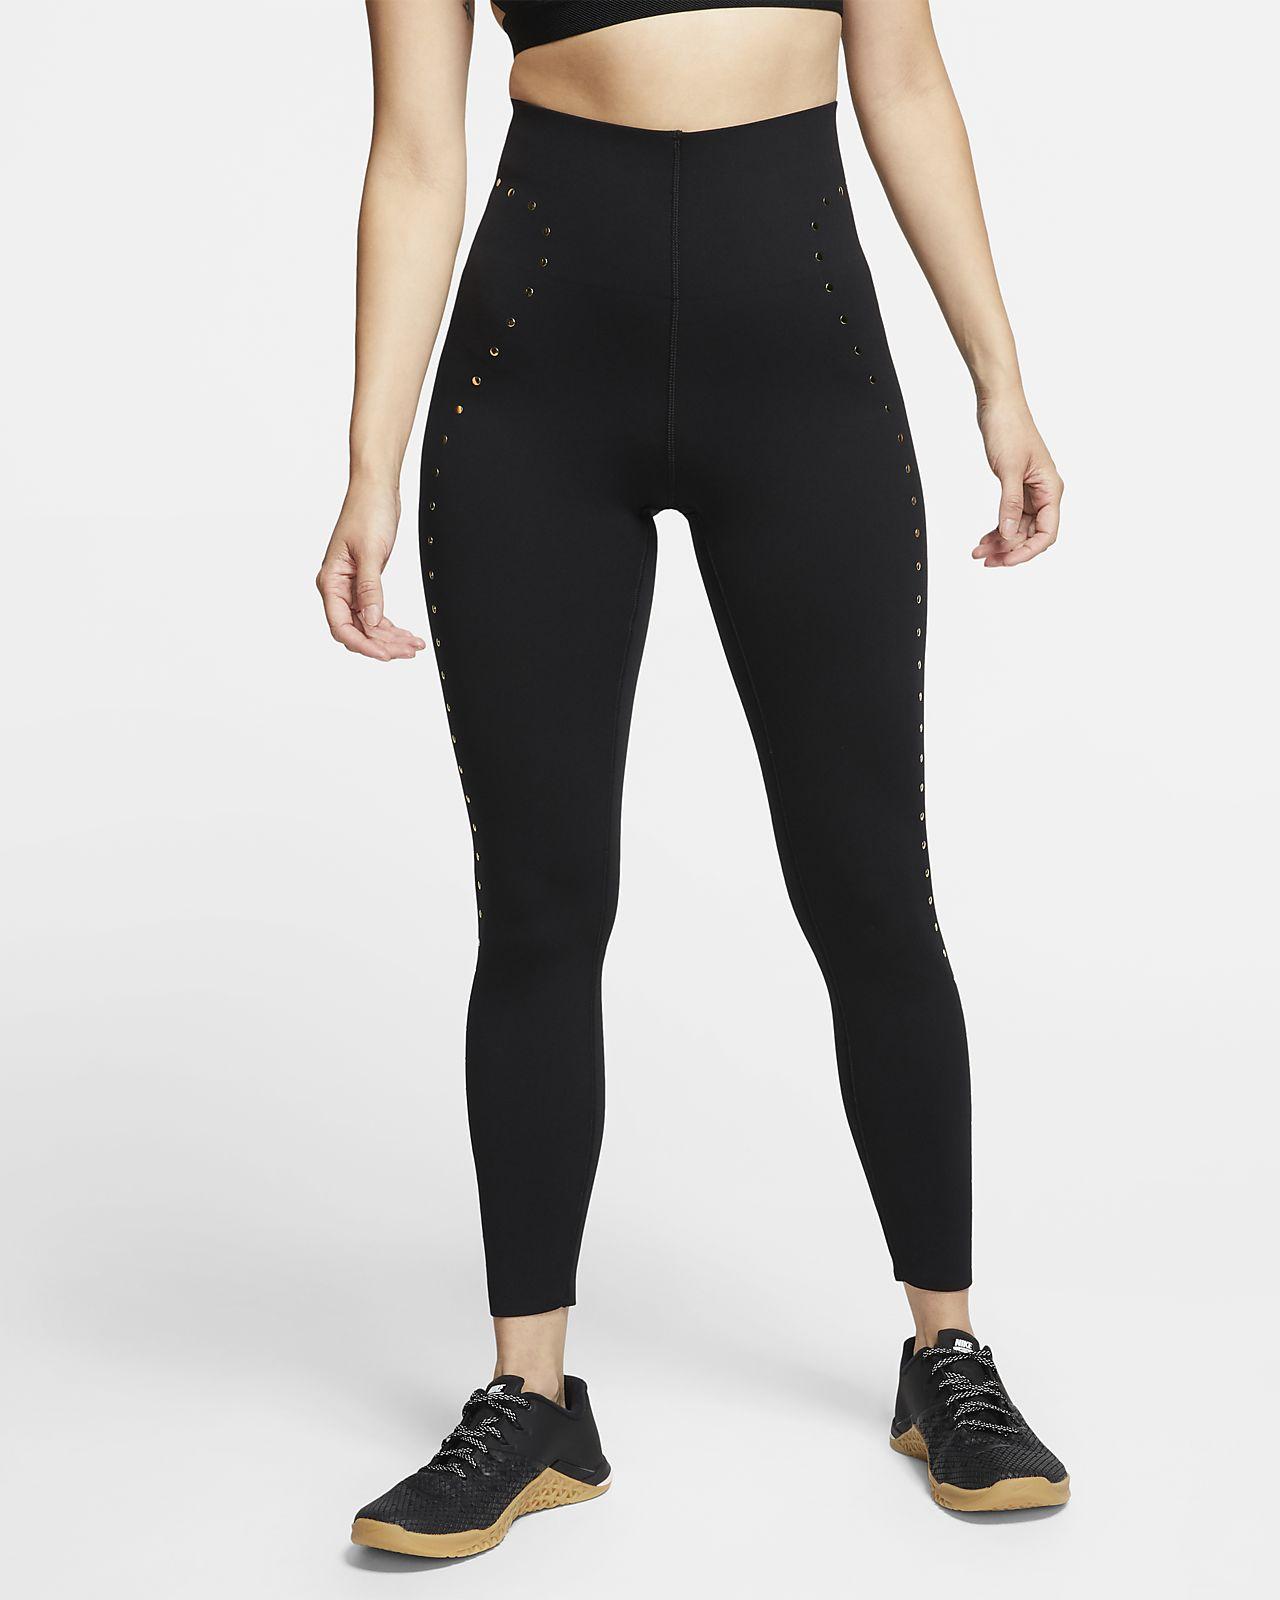 finest selection competitive price pretty cheap Nike 7/8-Trainings-Tights mit Nieten für Damen